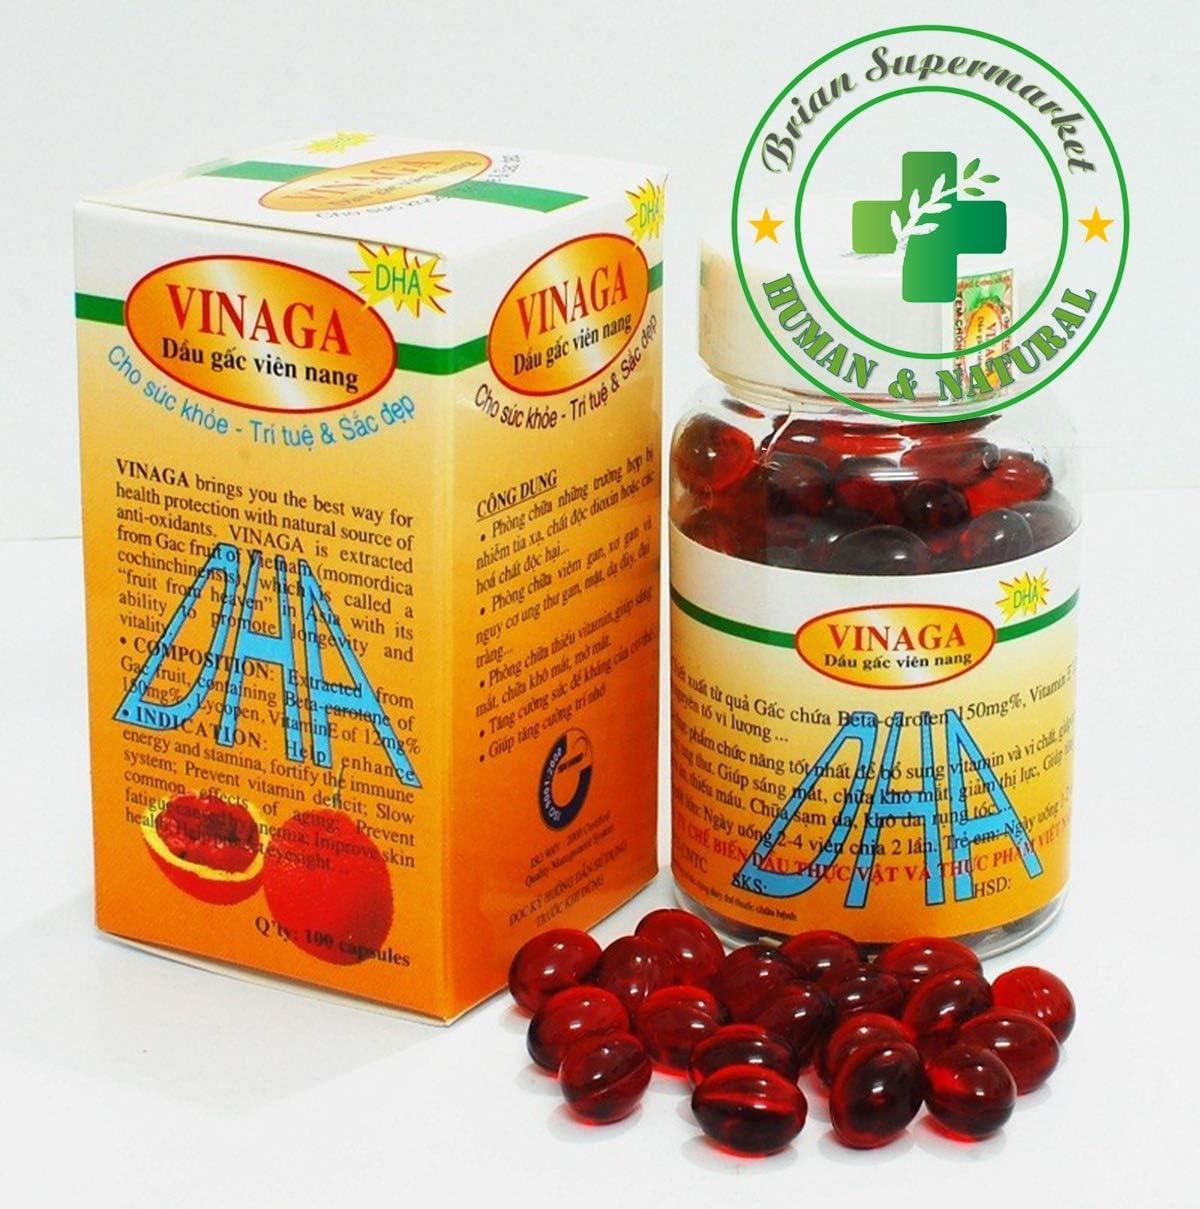 Brian Supermarket - Vinaga DHA Pure GAC Oil - Momordica GAC Fruit Vitamin A Vitamin E - Anti-Aging. 600 Capsules